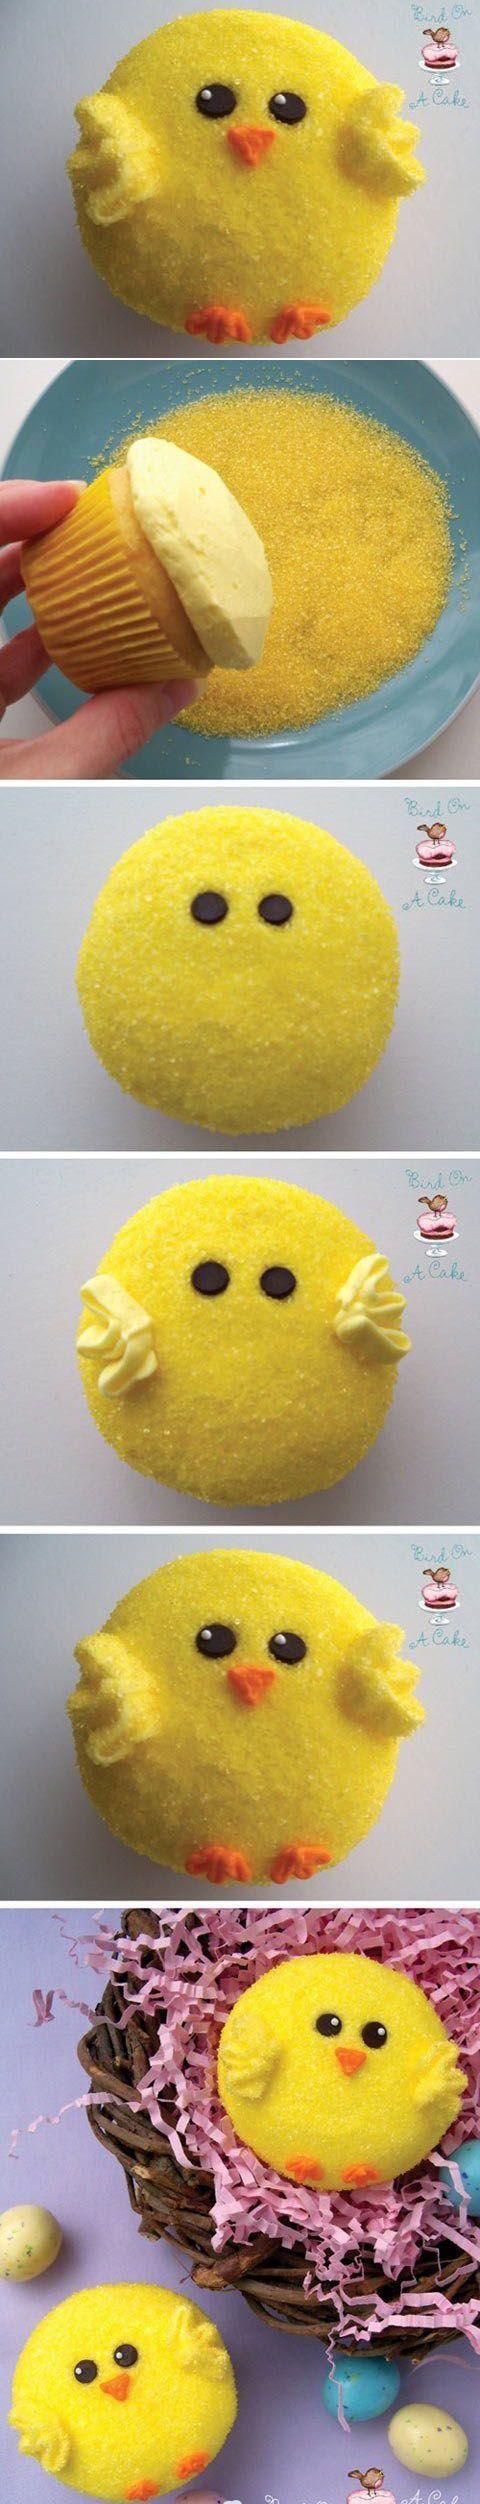 Diy Cute Cake   DIY & Crafts